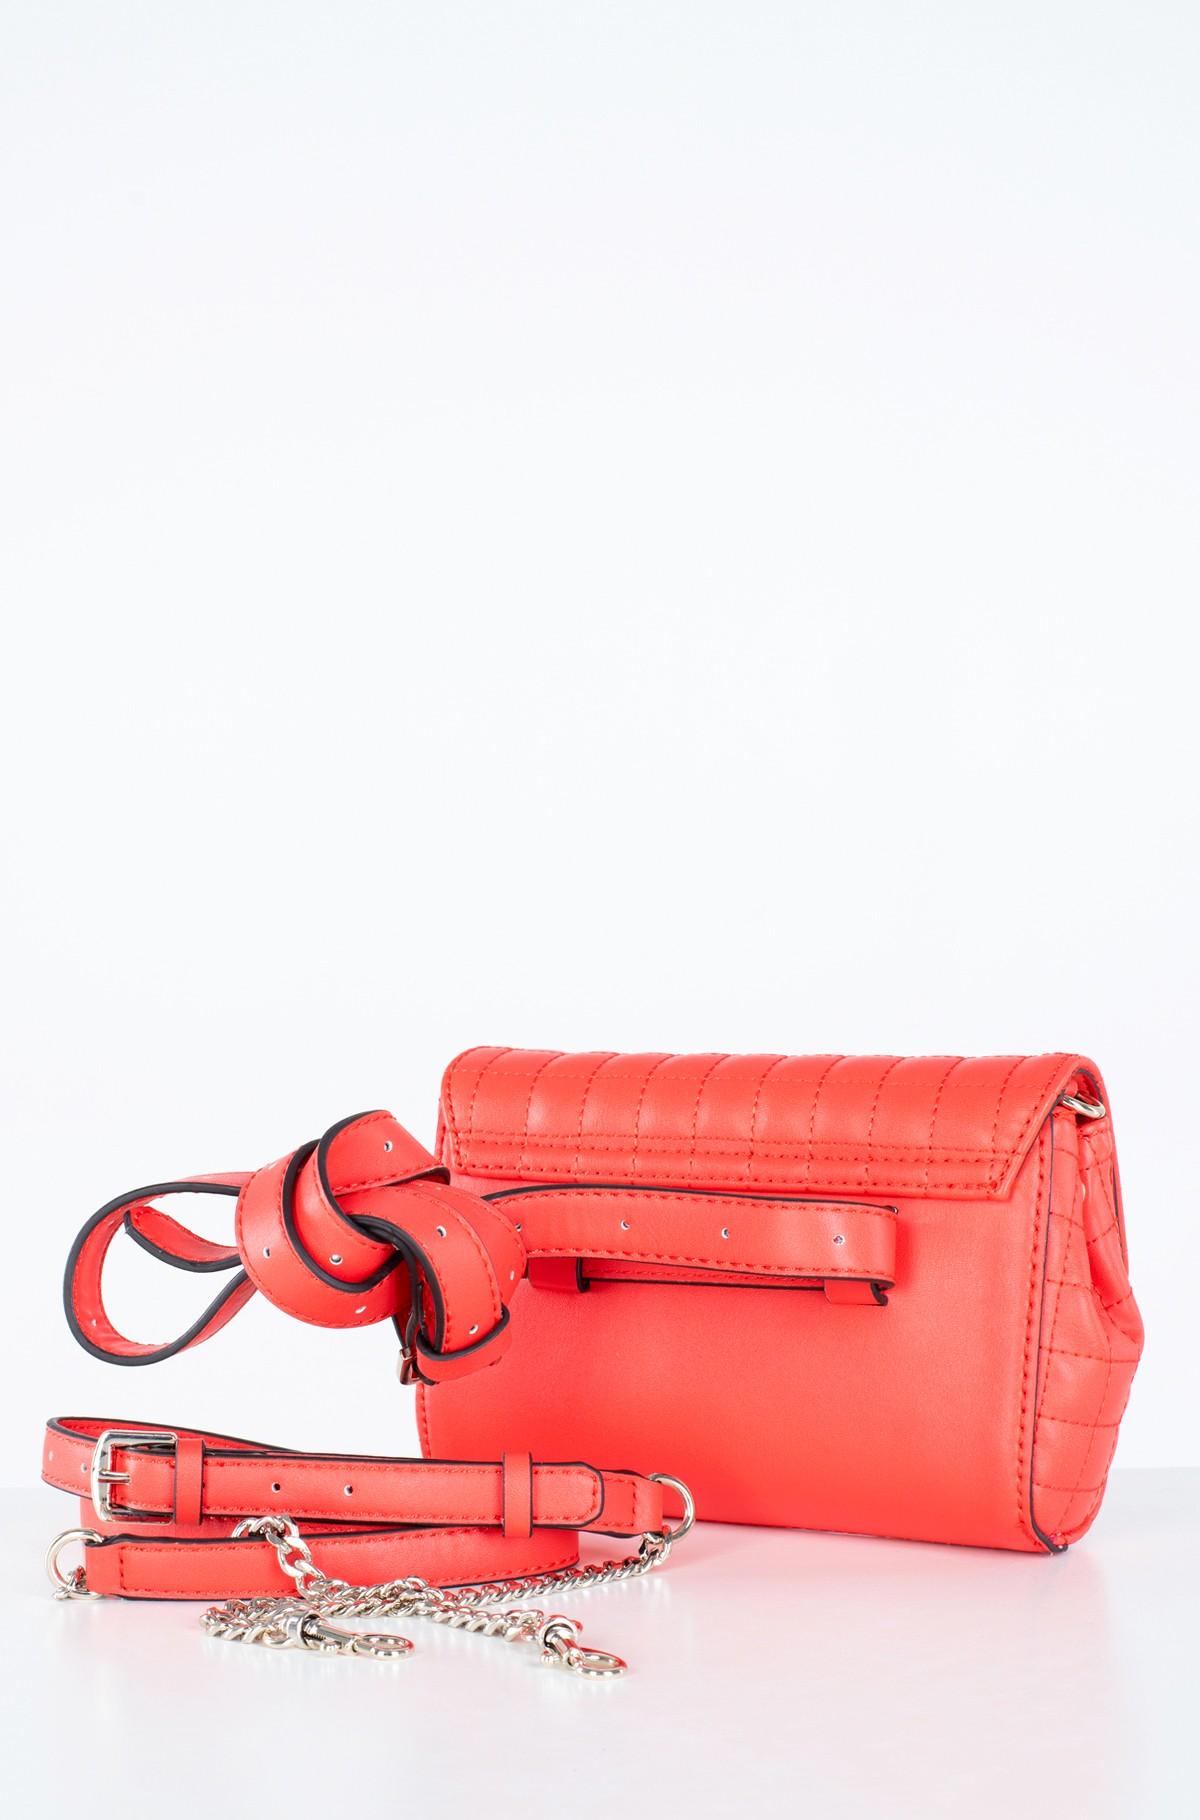 Waist bag/shoulder bag HWVG77 40810-full-3